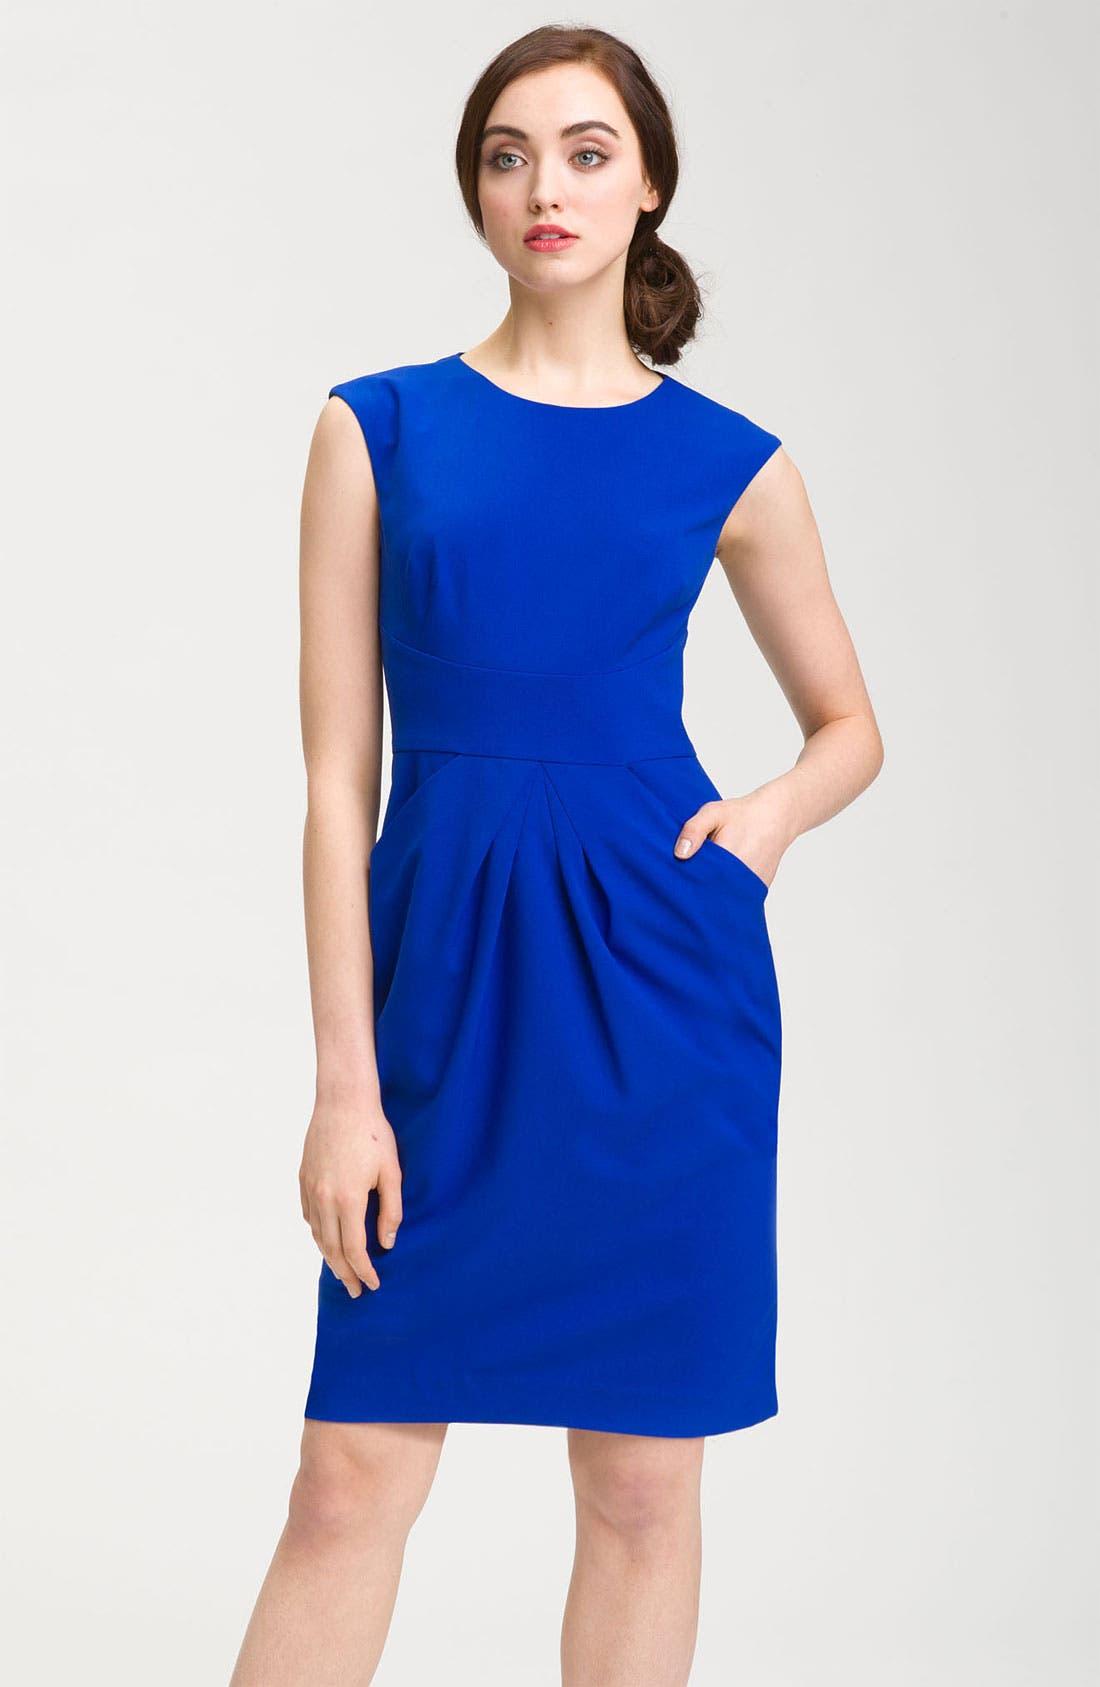 Alternate Image 1 Selected - Calvin Klein Cap Sleeve Woven Sheath Dress